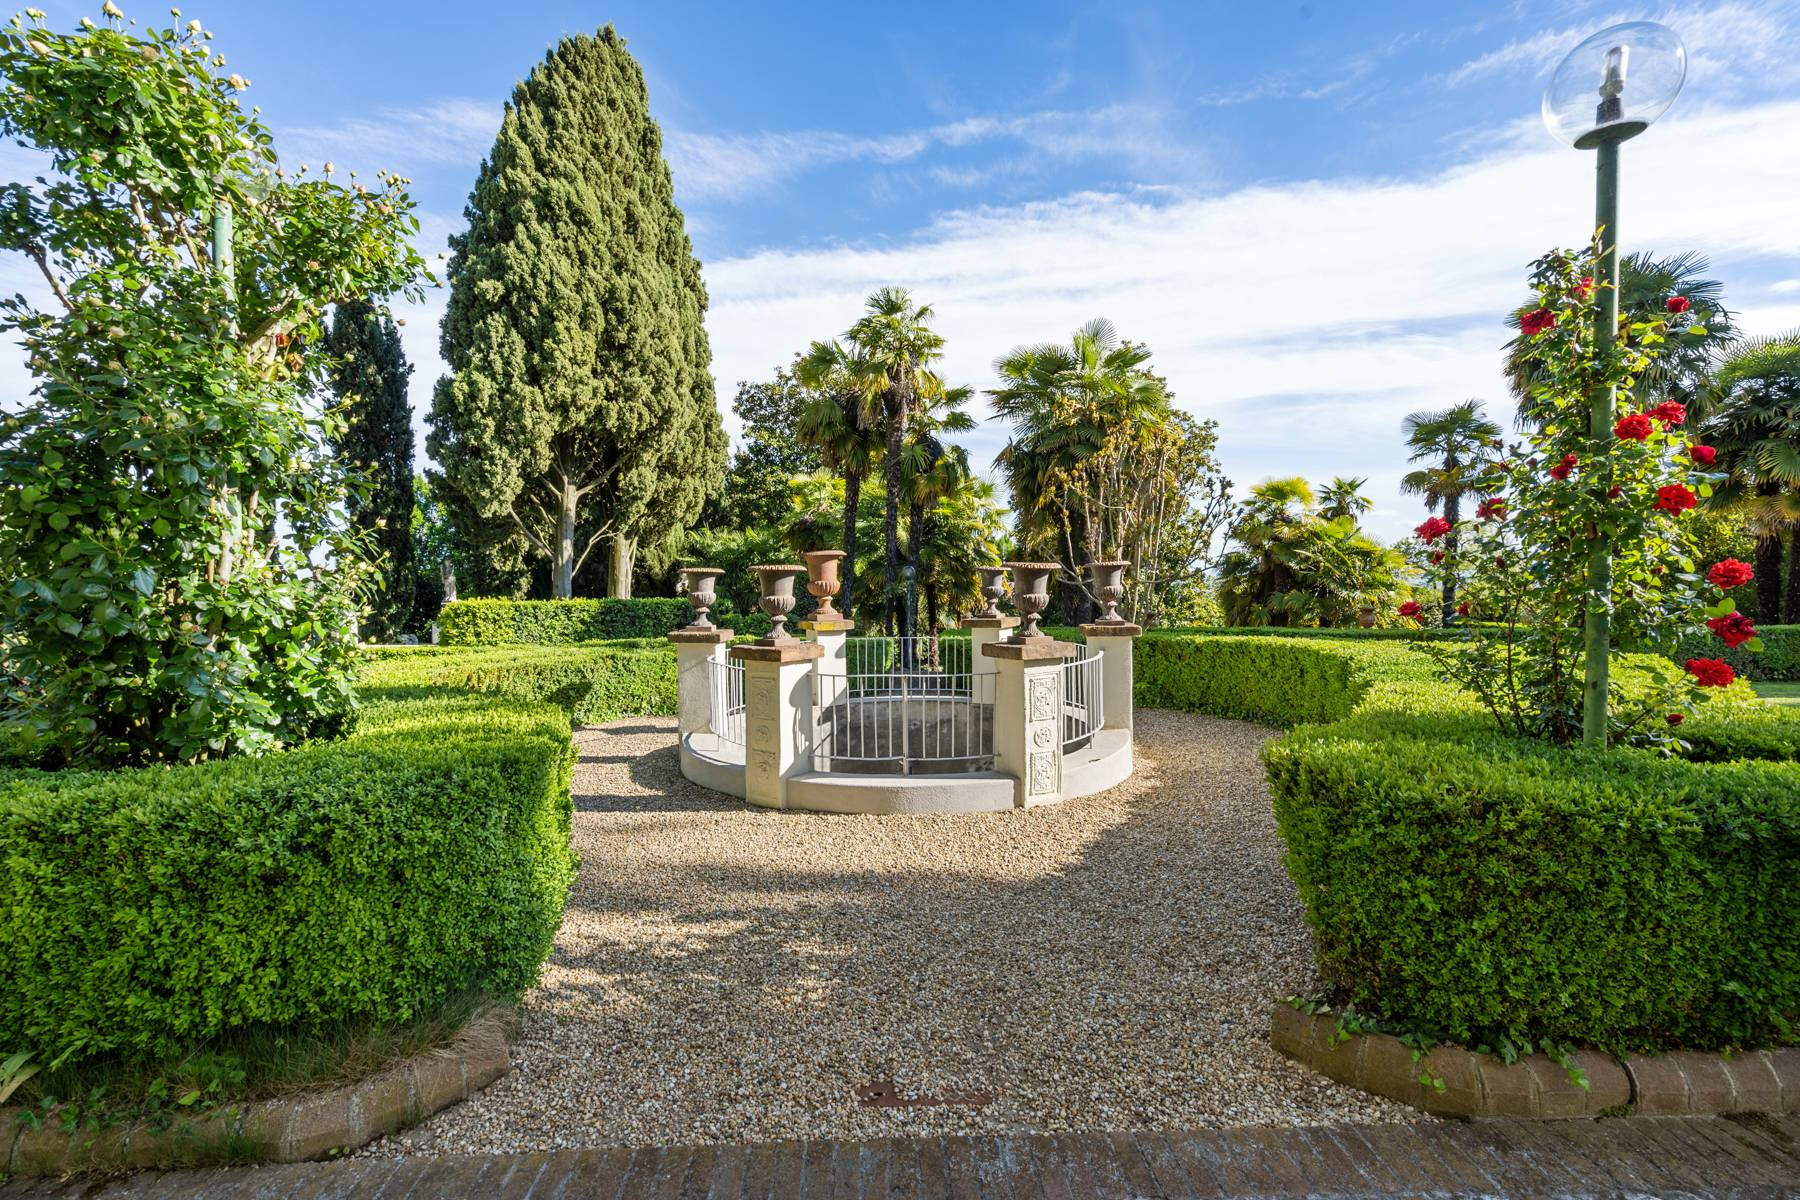 Villa in Vendita a Pino Torinese: 5 locali, 2087 mq - Foto 29